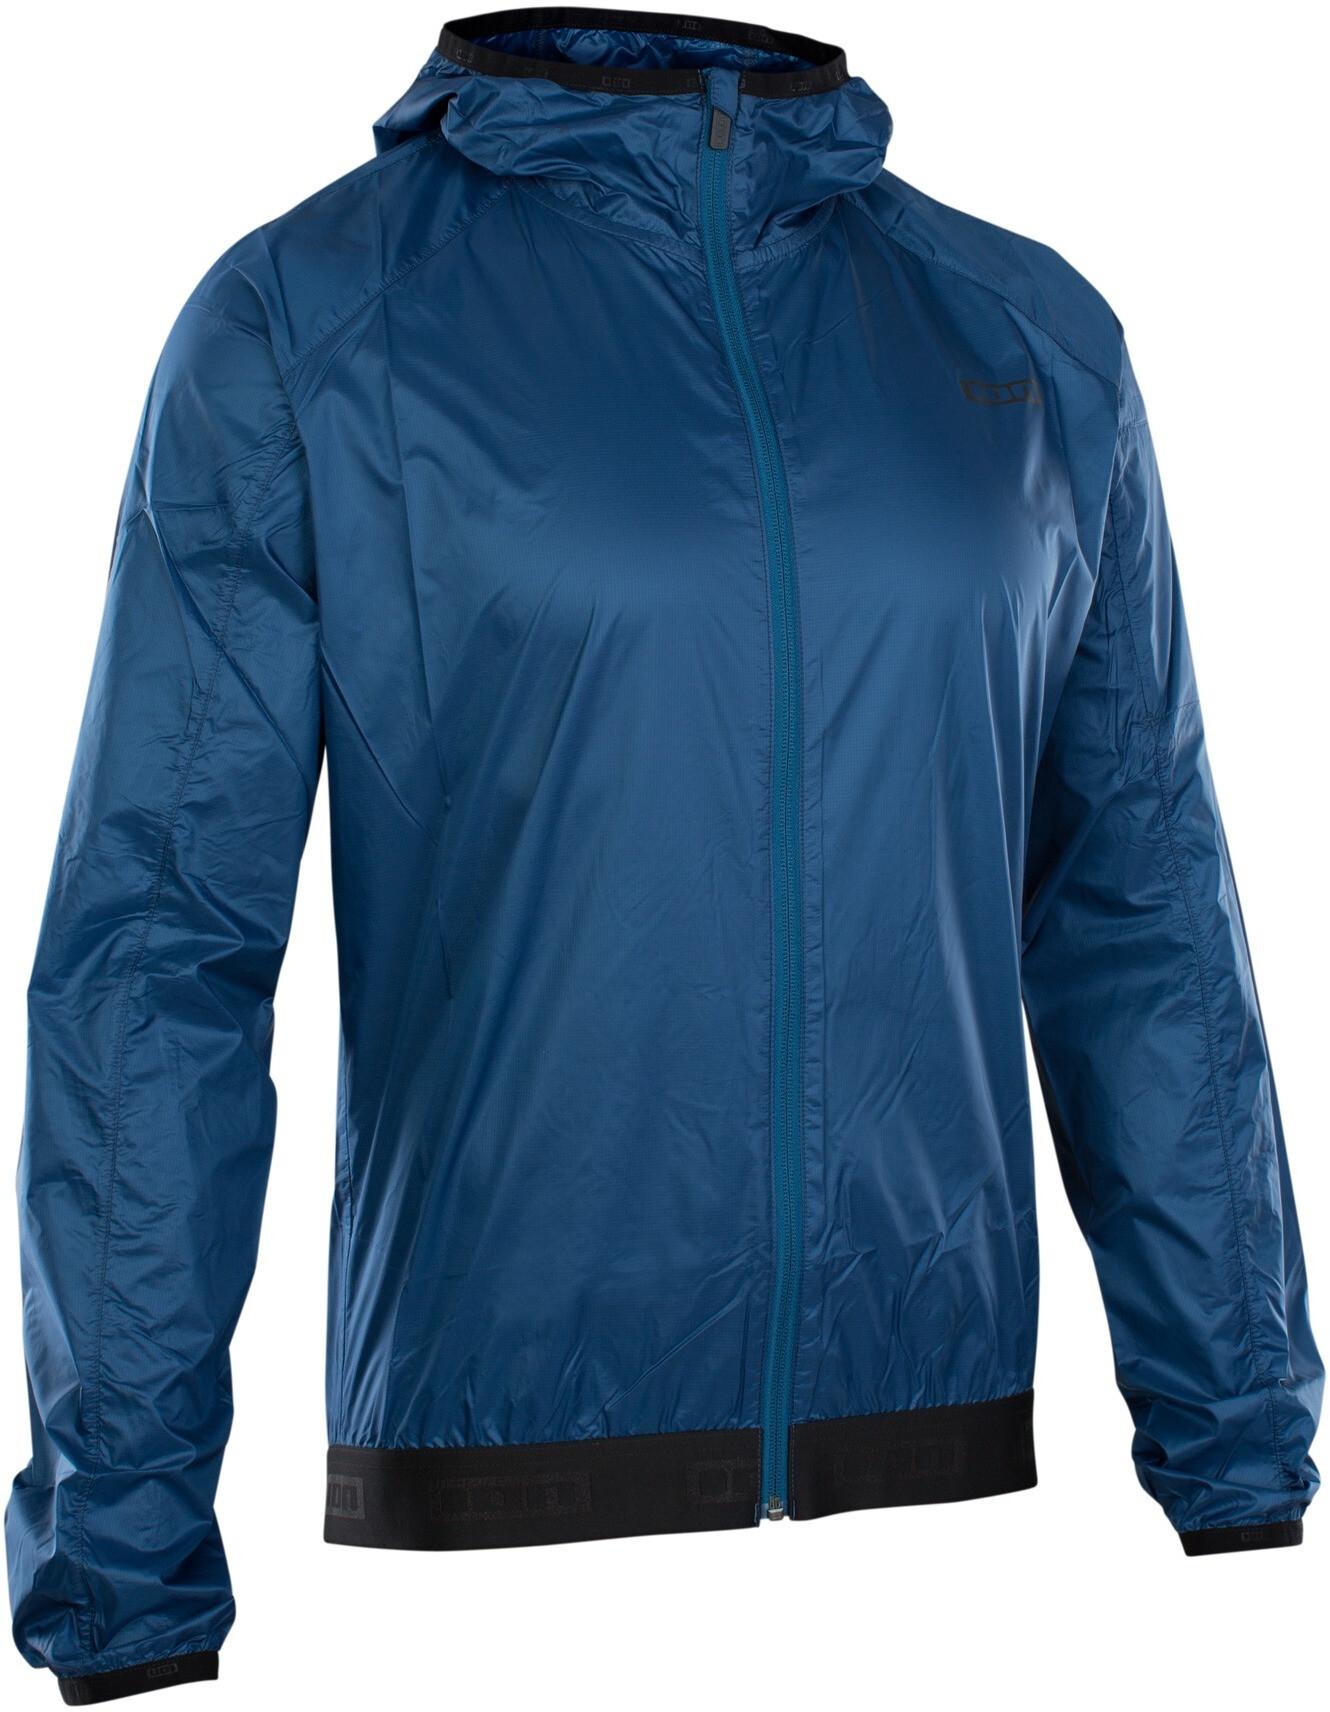 bikester.dkion shelter windbreaker jacket ocean